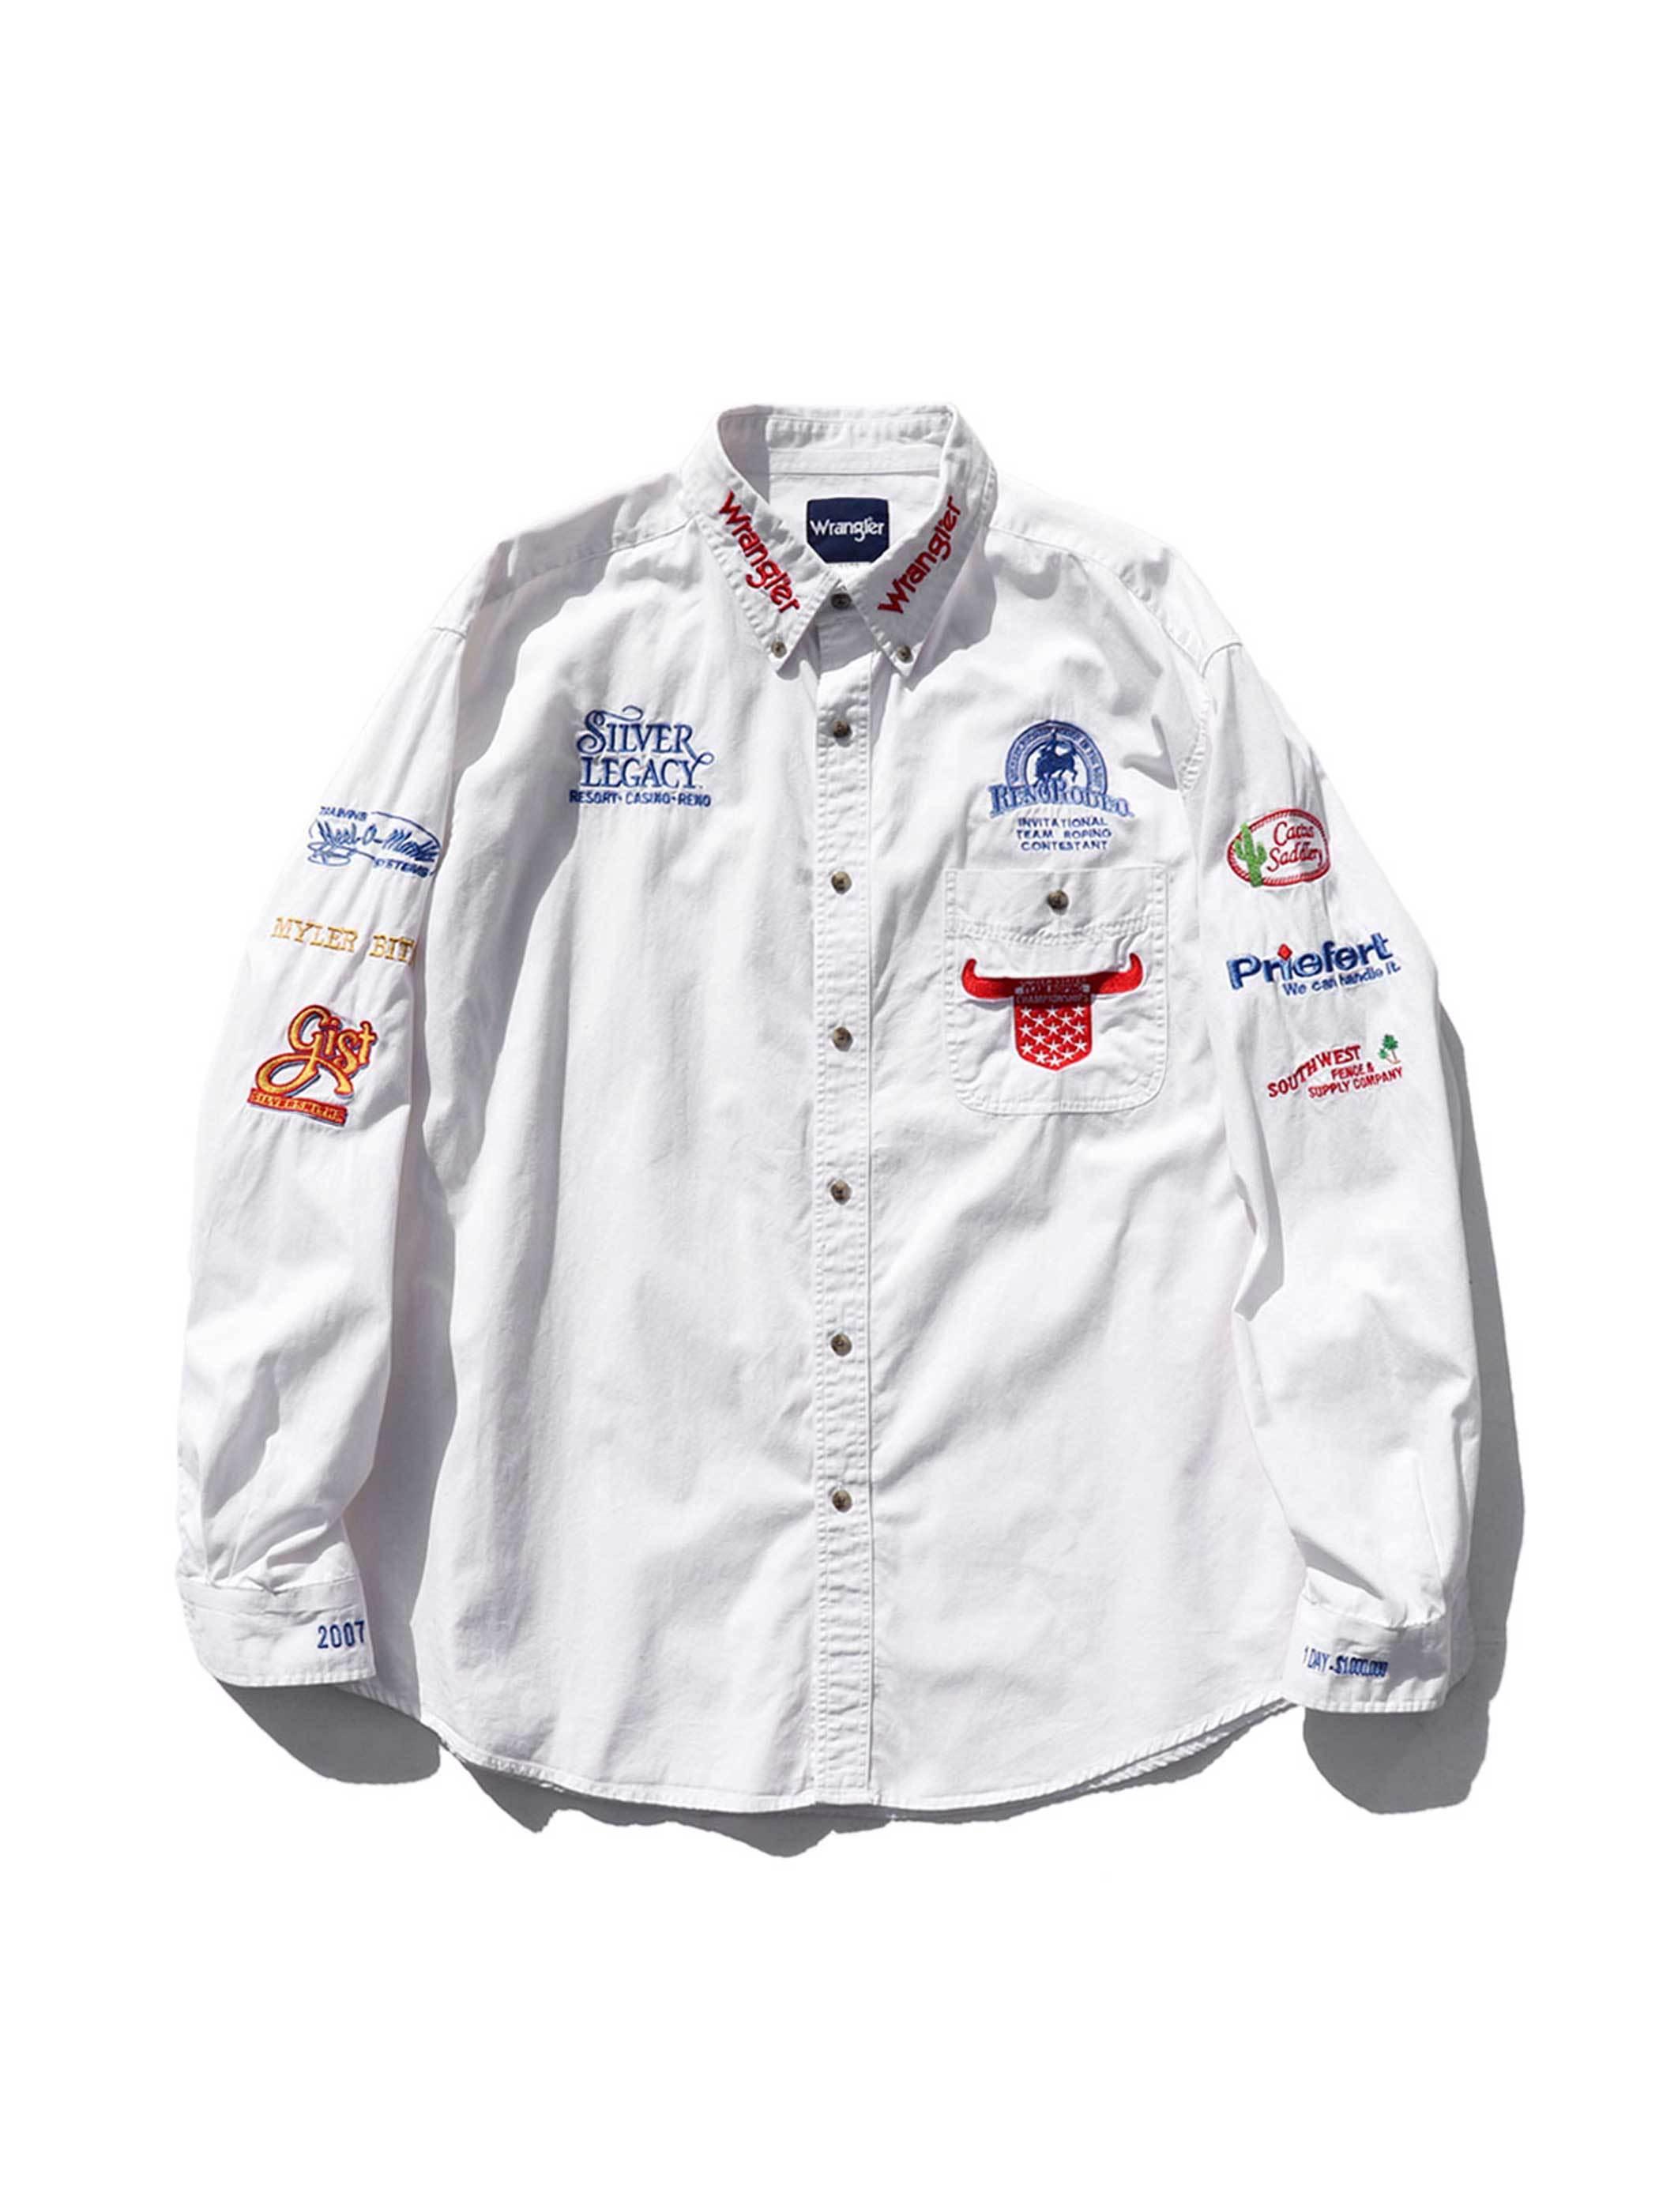 00's WRANGLER TEAM ROPING ロデオイベント L/Sシャツ [XL]